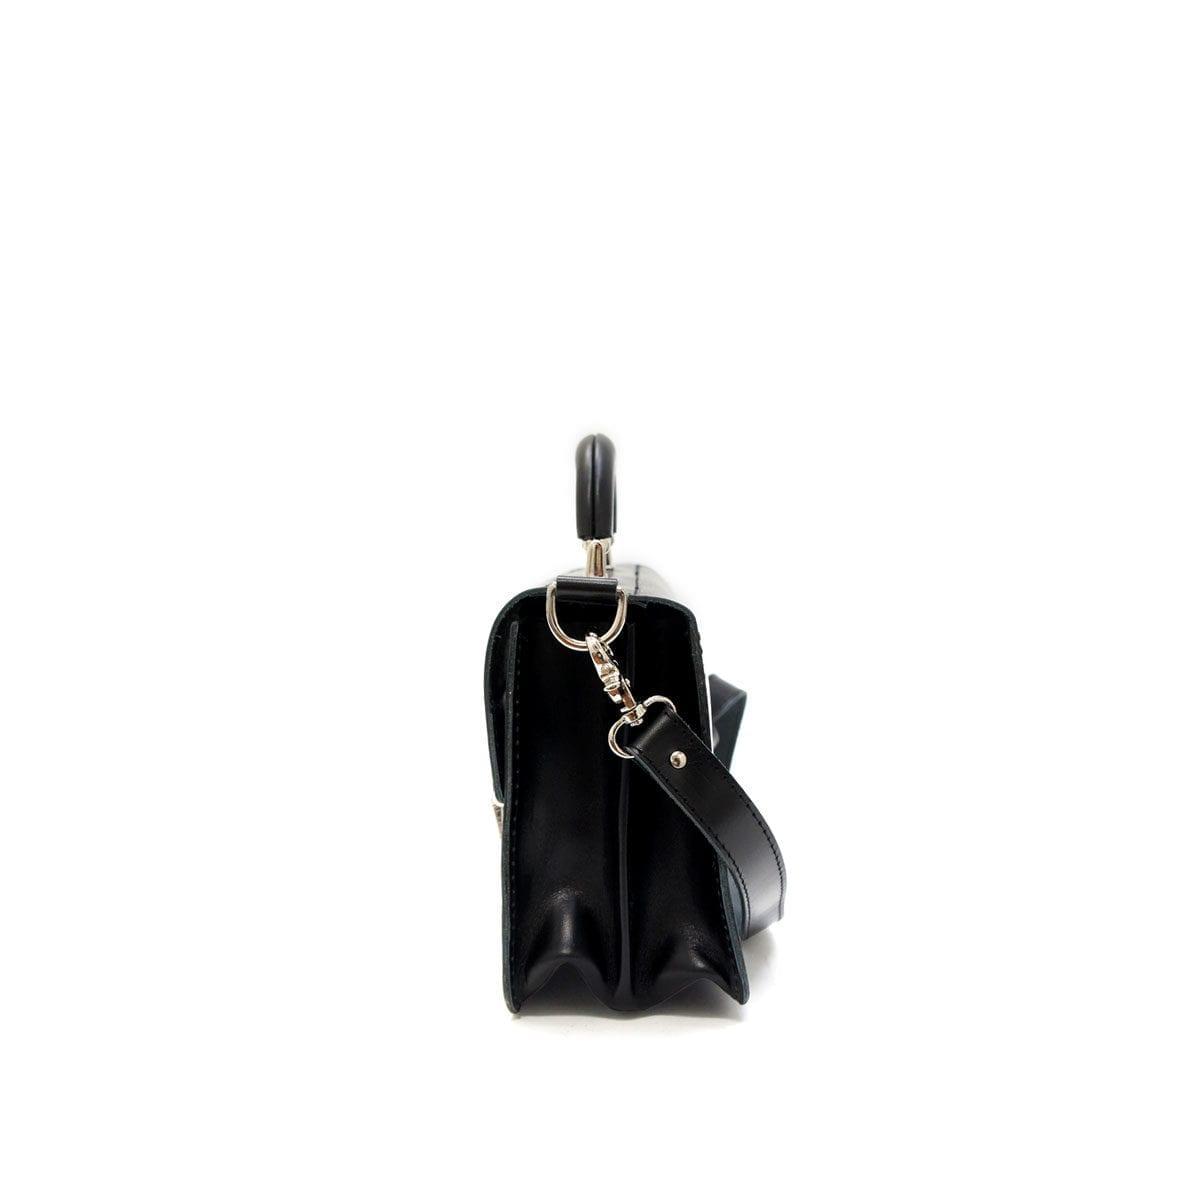 LUMI Miki Small Postman Bag, in black.